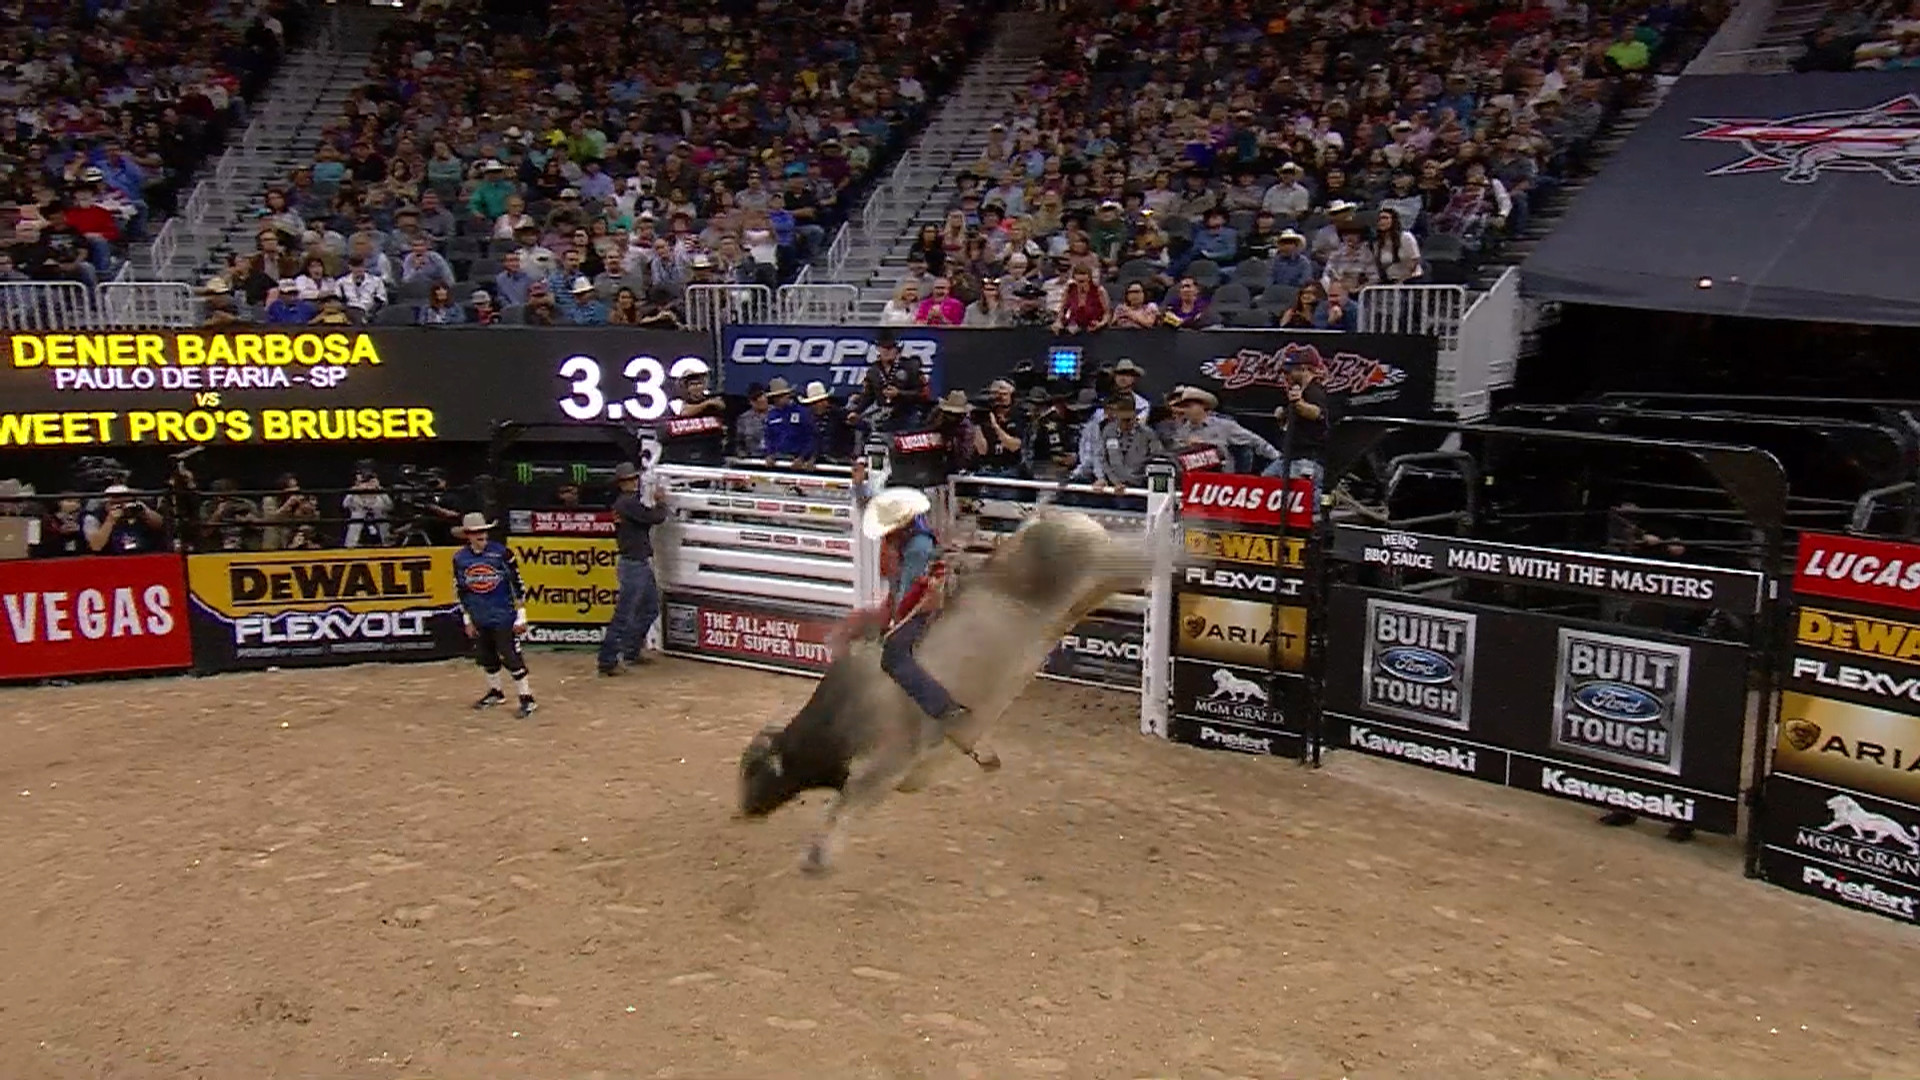 Pbr Bull Riding Wallpaper 69 Images